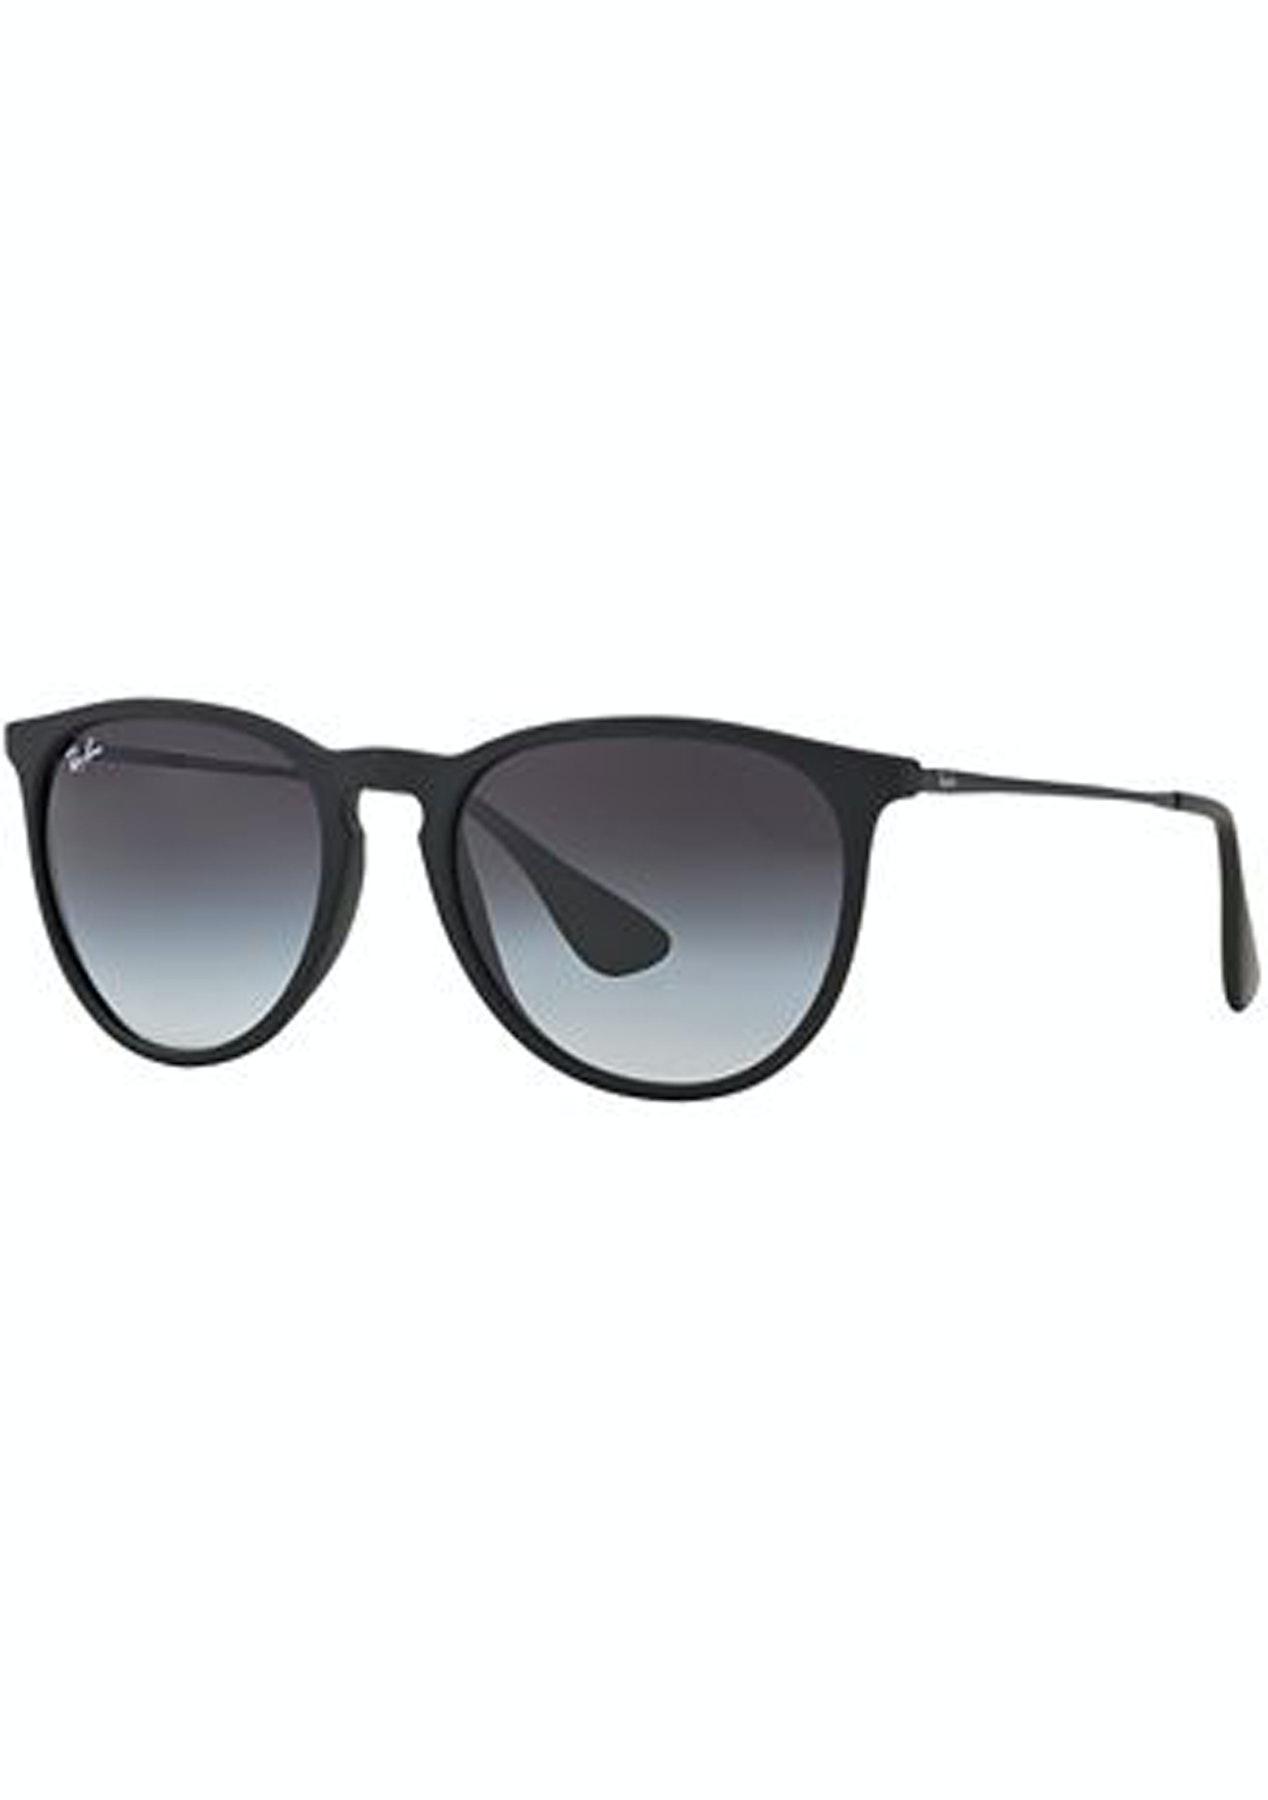 c01c6a0124 Ray-Ban - Erika Womens Sunglasses - Matte Black - Big Brand Eyewear - Onceit